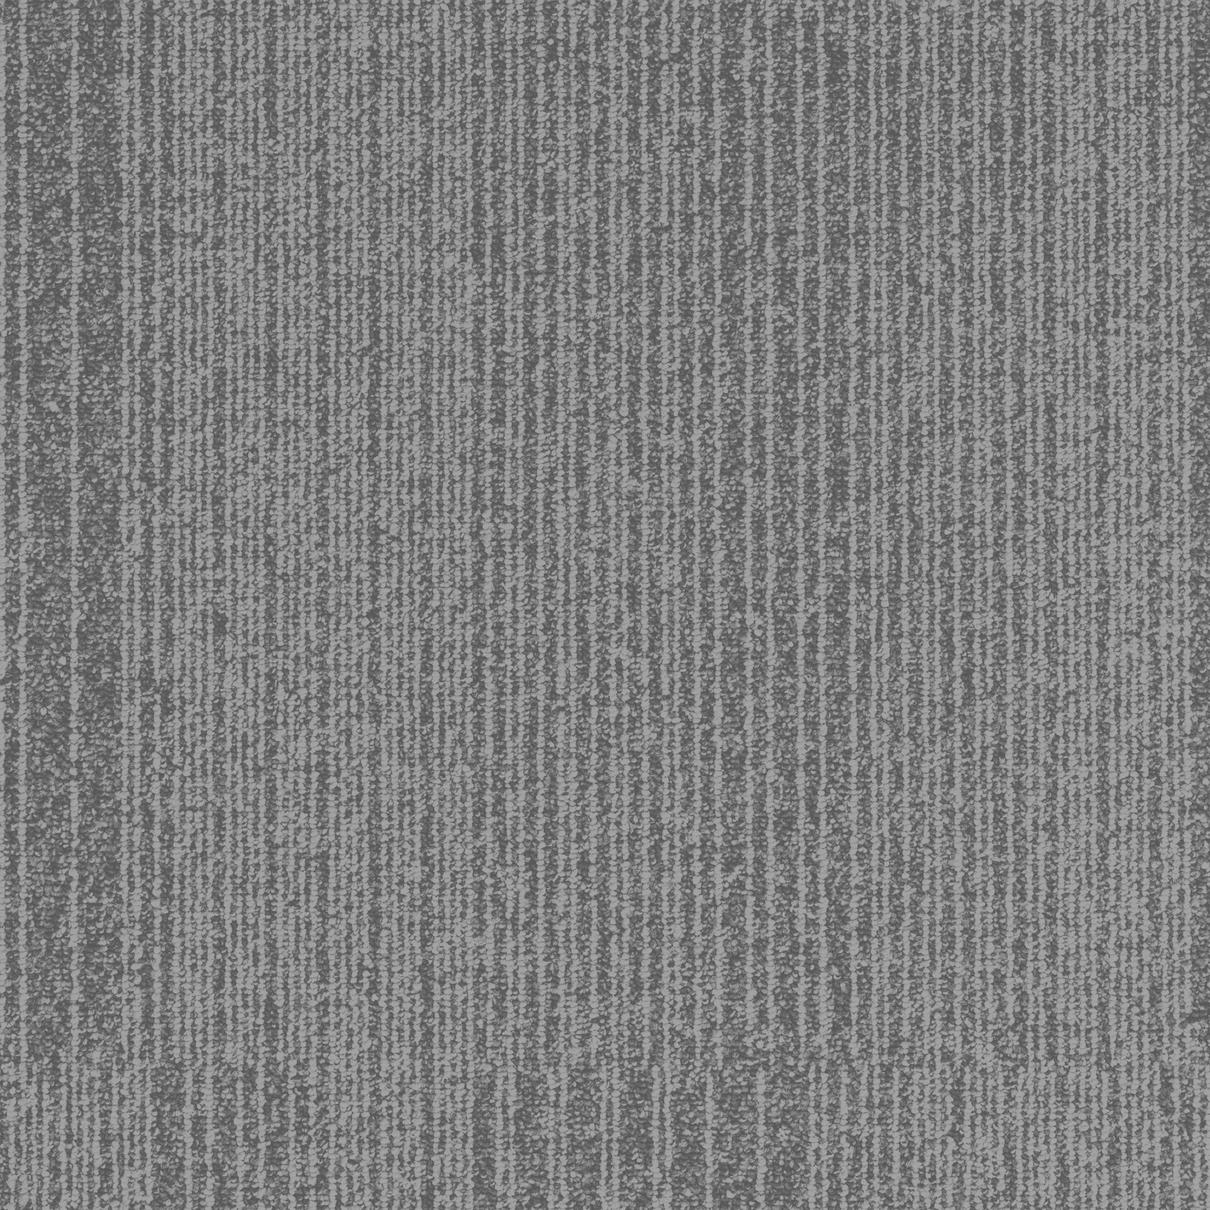 TRIV_N915.jpg